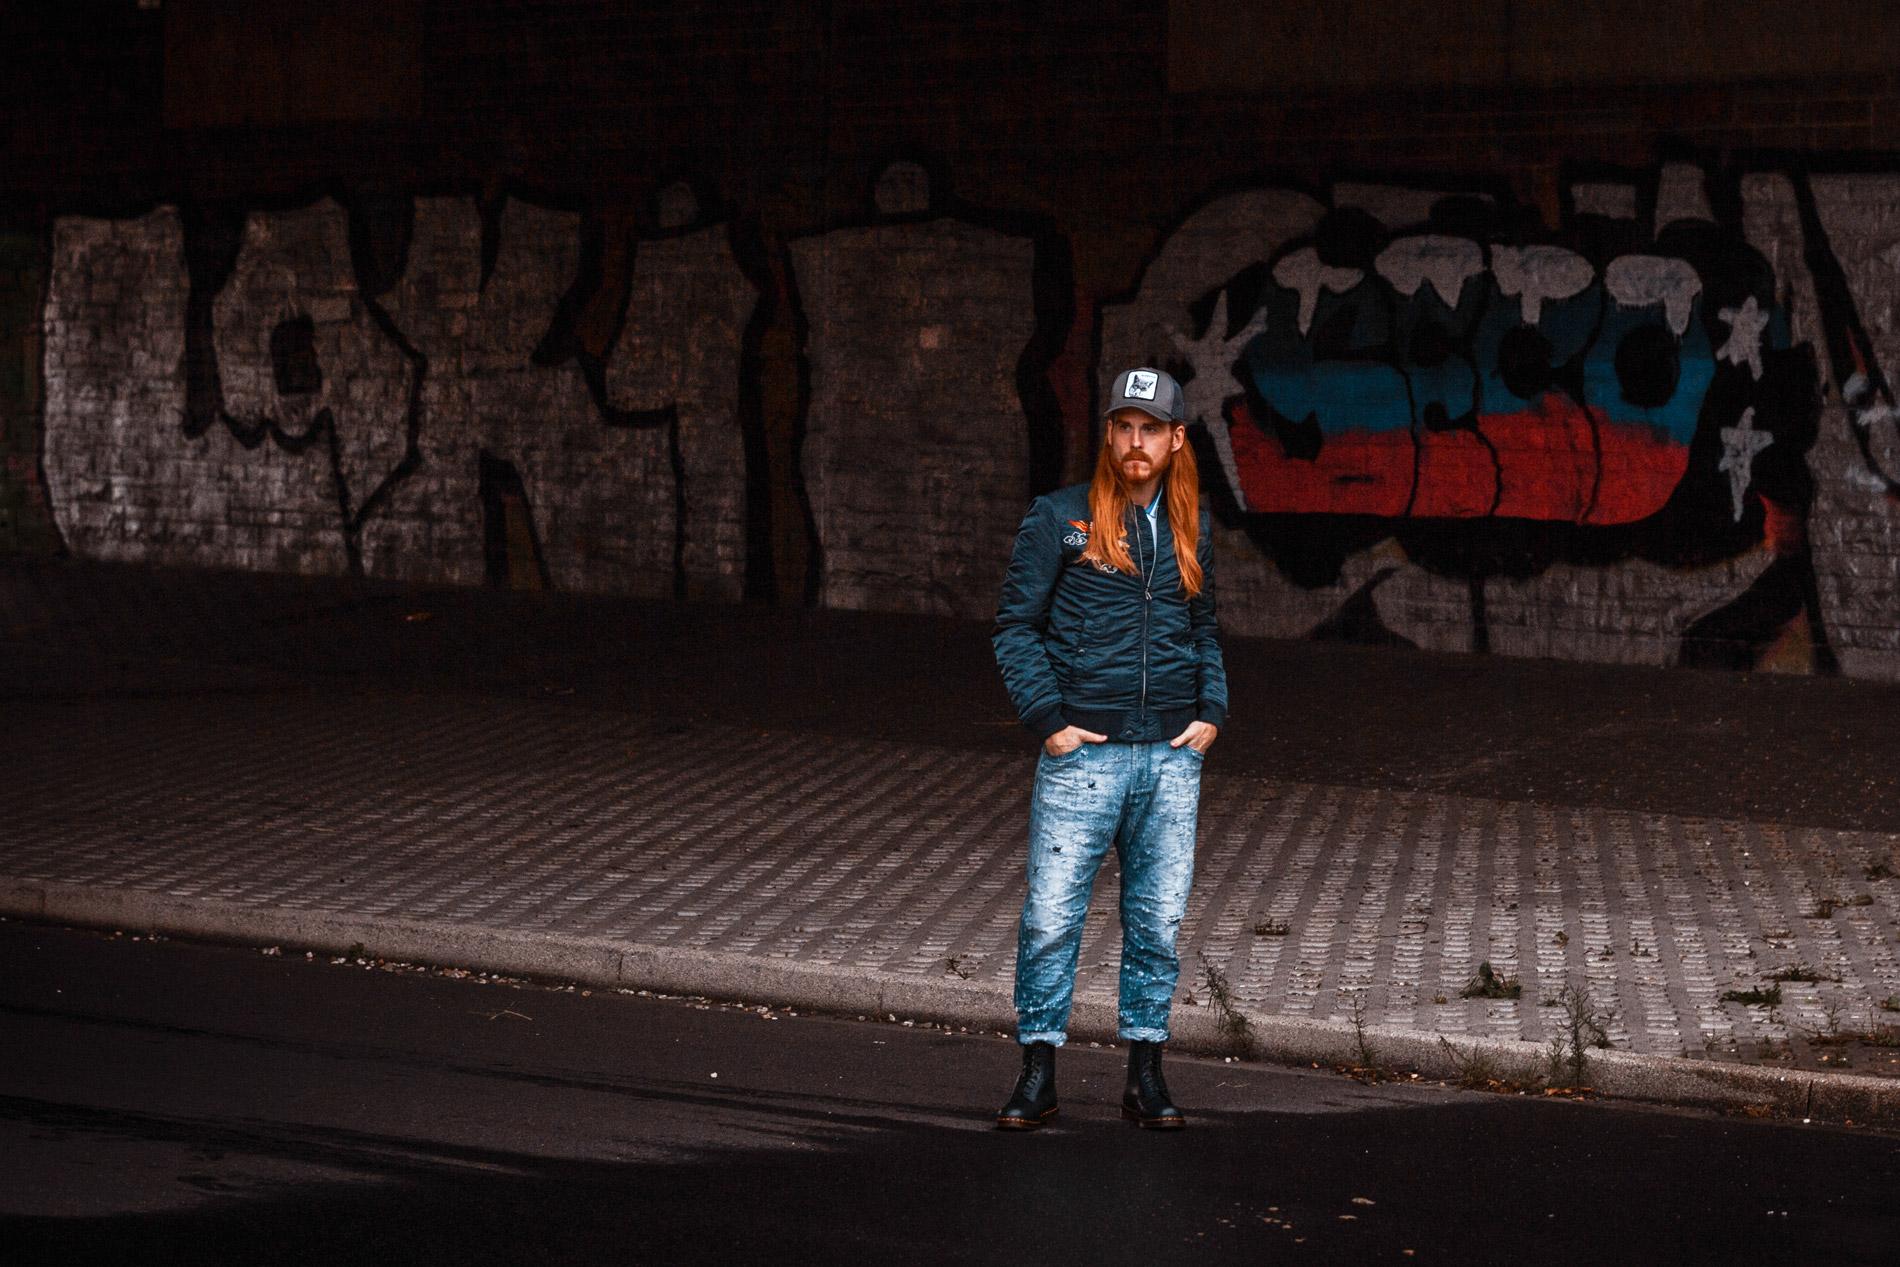 Kaisers-neue-Kleider-Malefashion-Herbstlook-Bomberjacke-Jeans-Dr-Martens-Boots-Trucker-Cap-Streetstyle